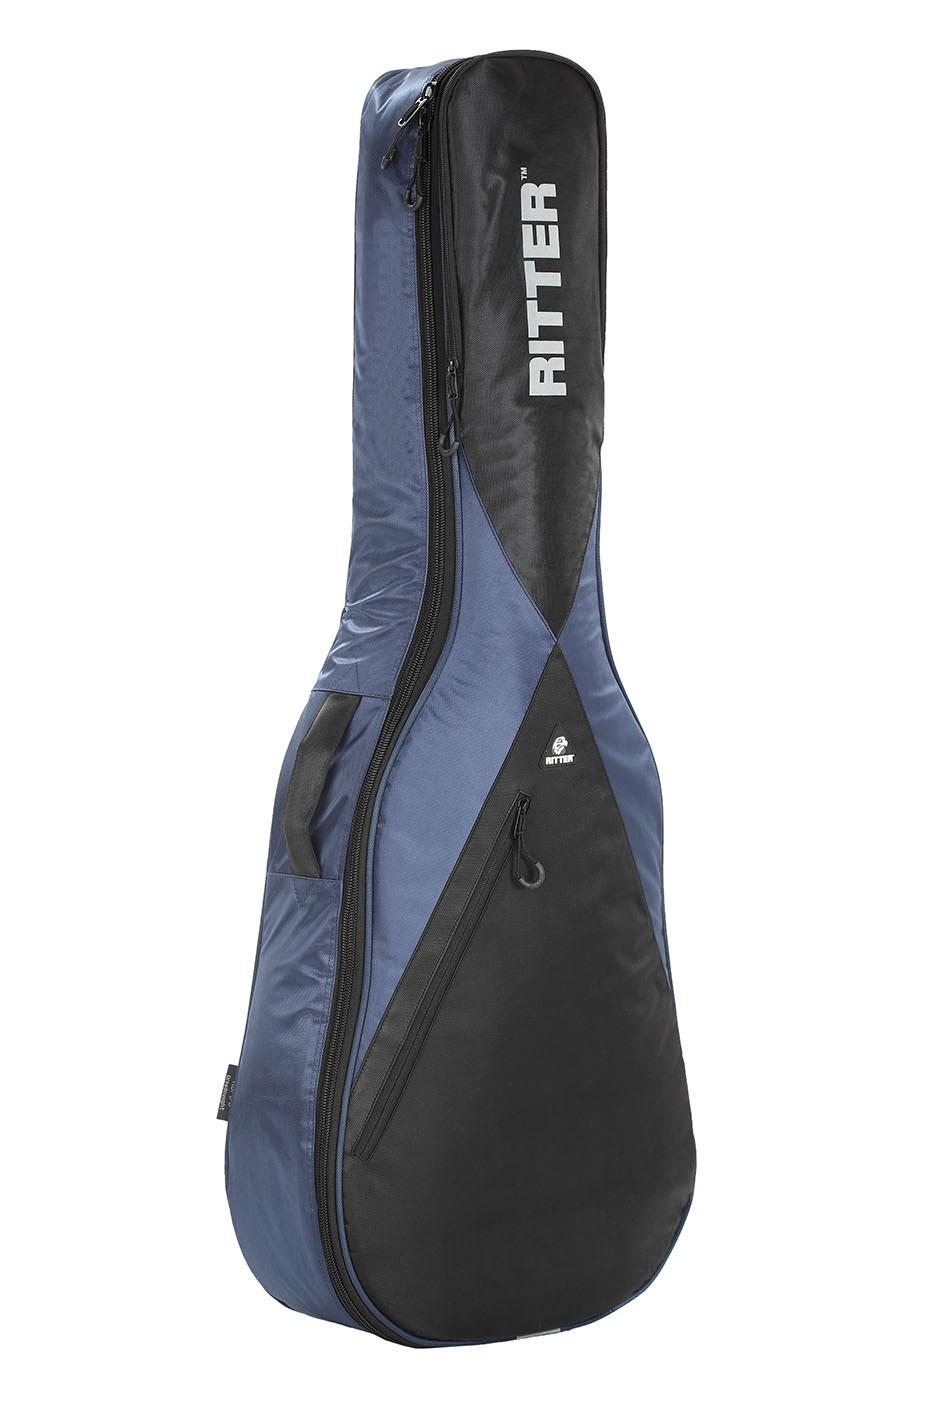 Ritter RGP5-F/NBK Folk Acoustic Guitar Bag - Navy/Black